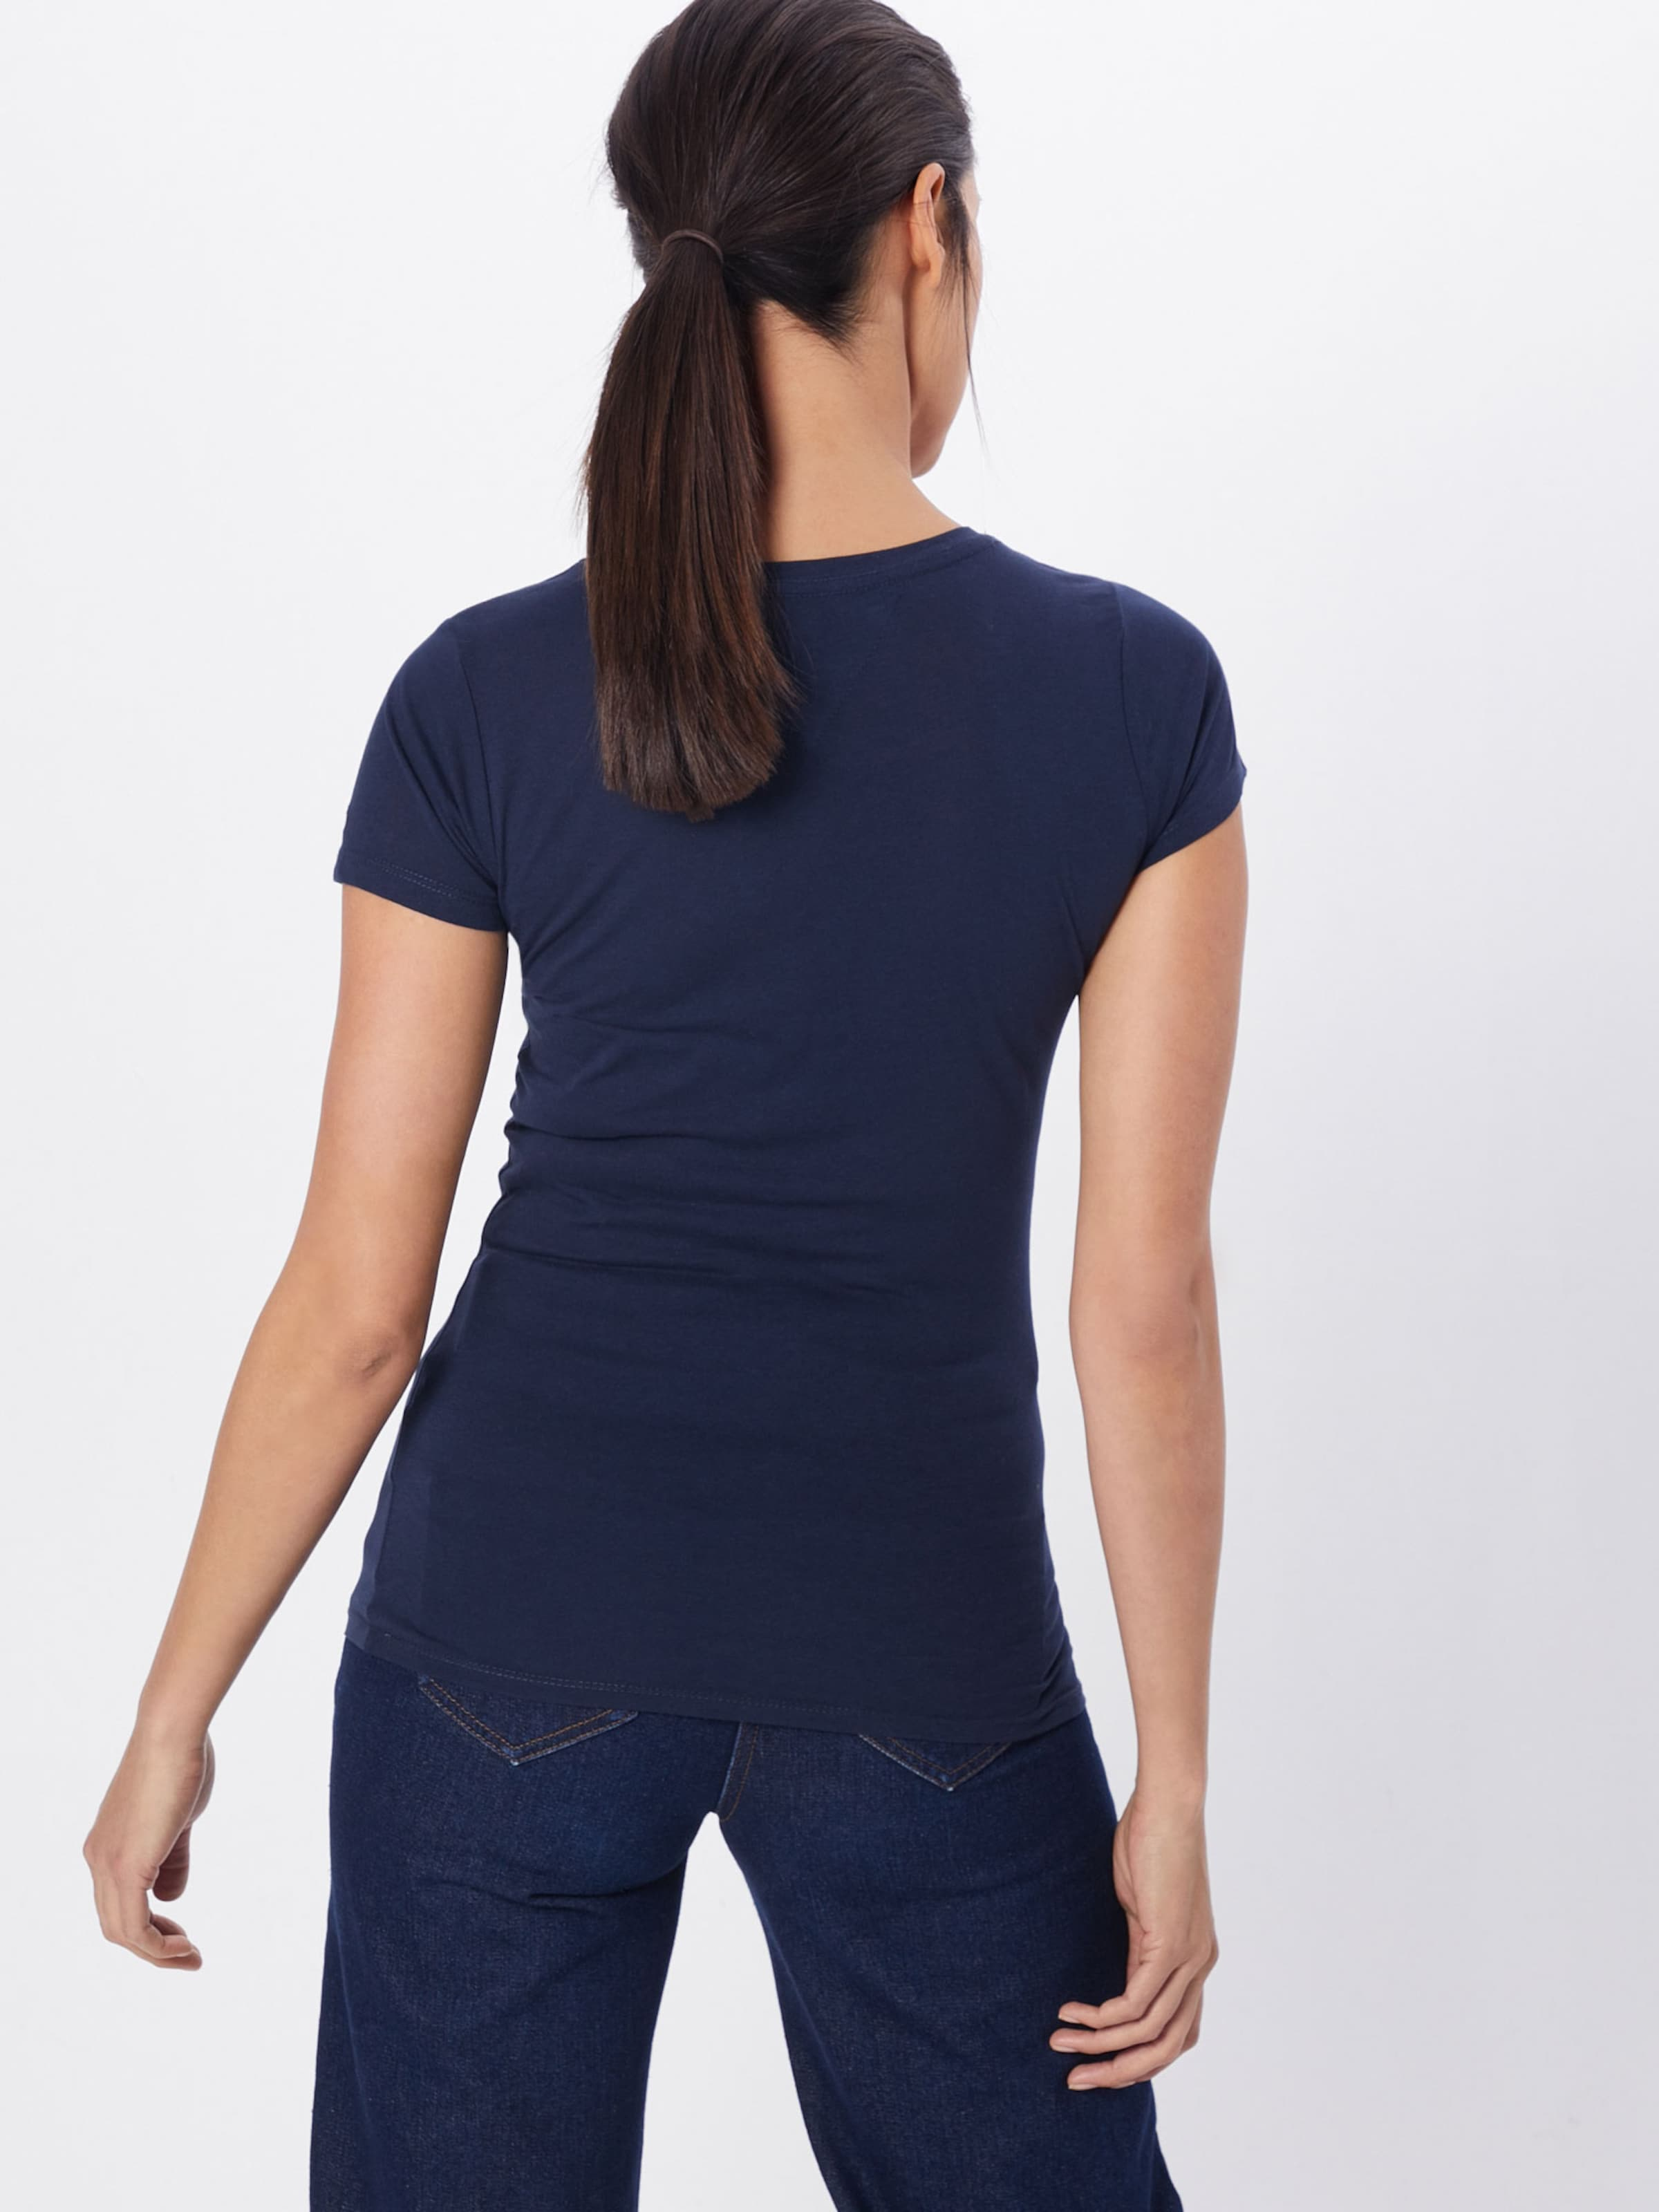 Casual Tee' 'tjw Tommy In NavyWit Shirt Jeans kuZiXP